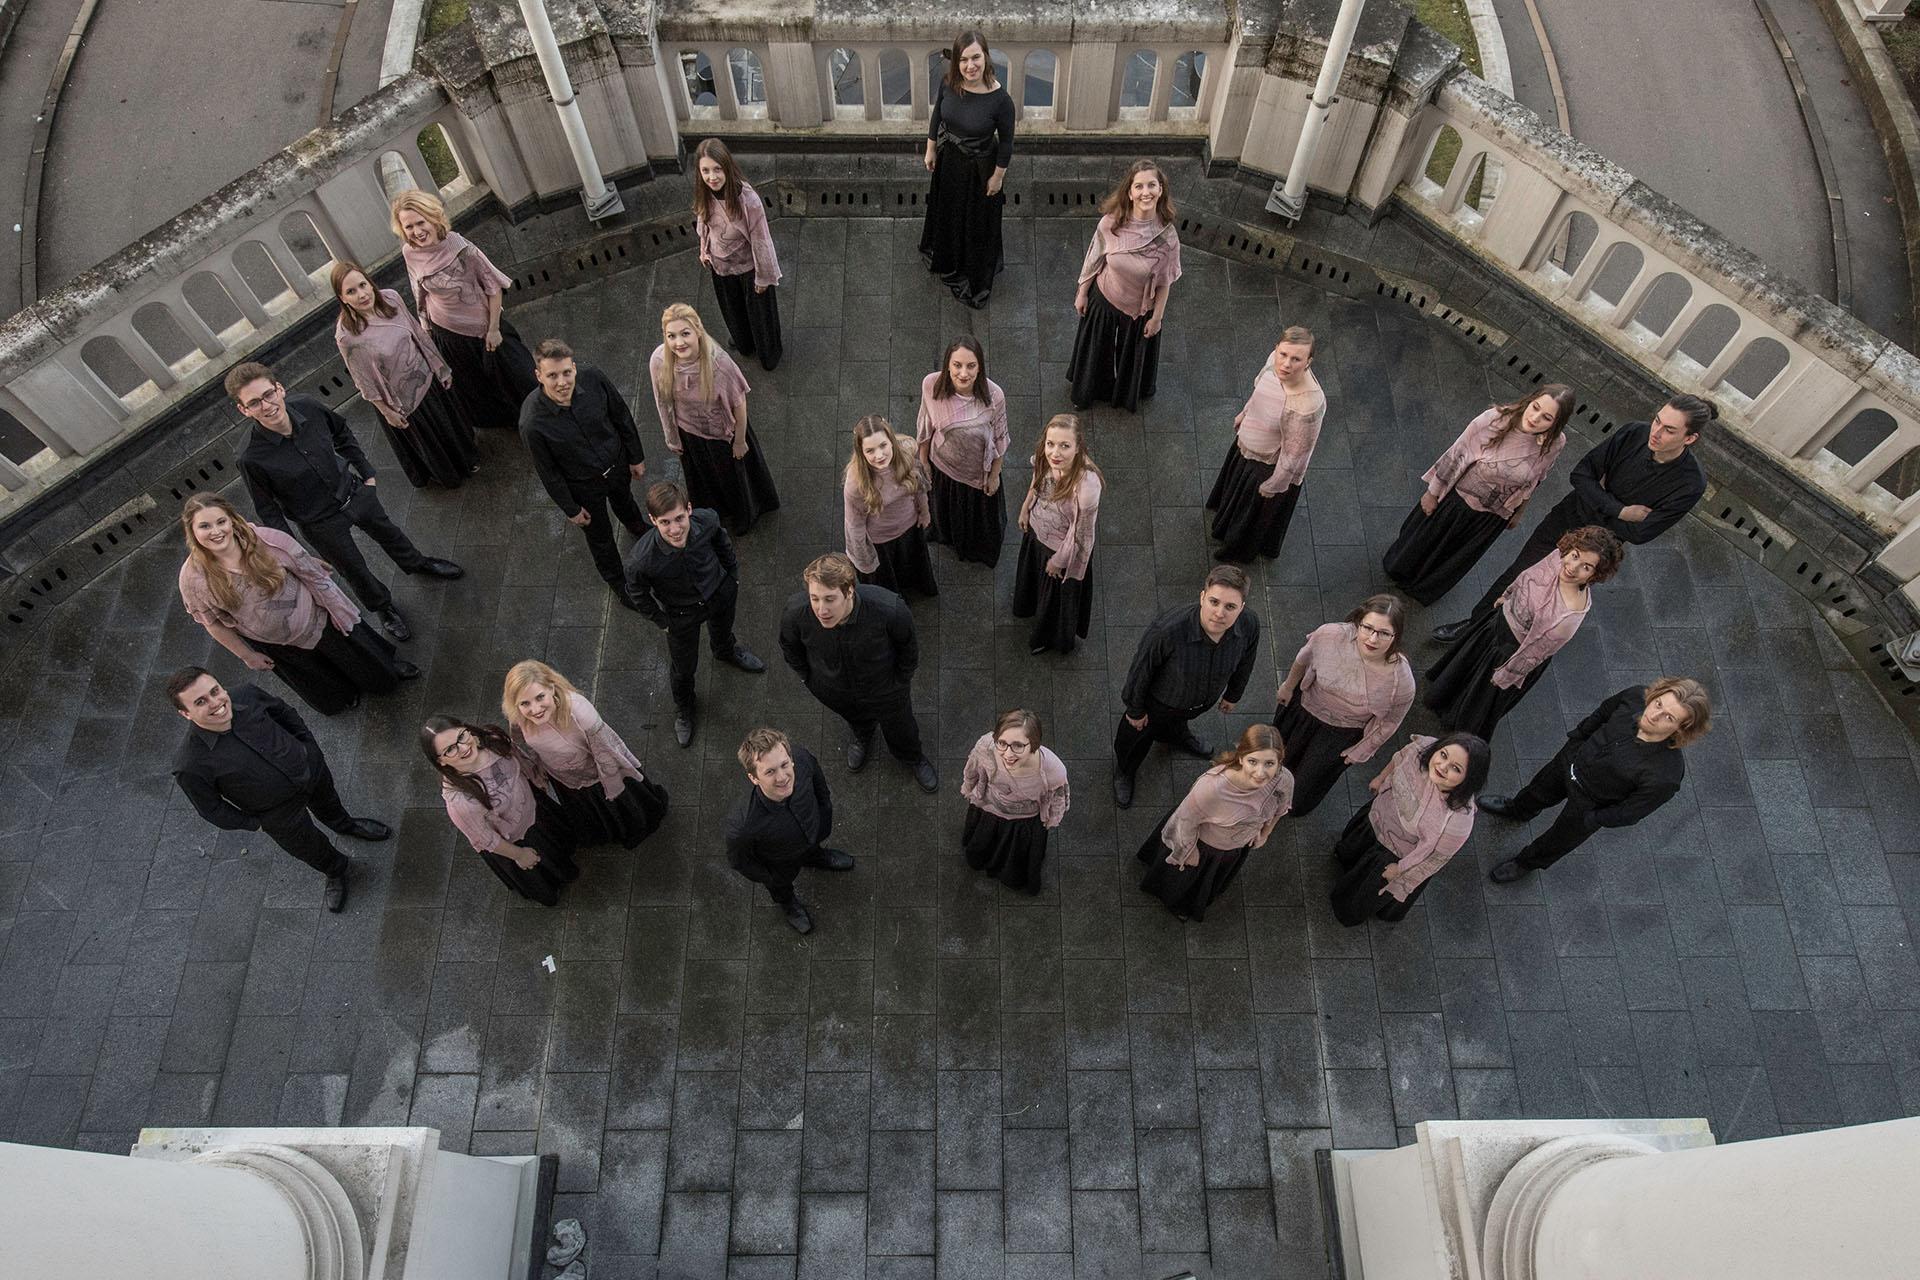 Domov - Akademski pevski zbor Tone Tomšič Univerze v Ljubljani